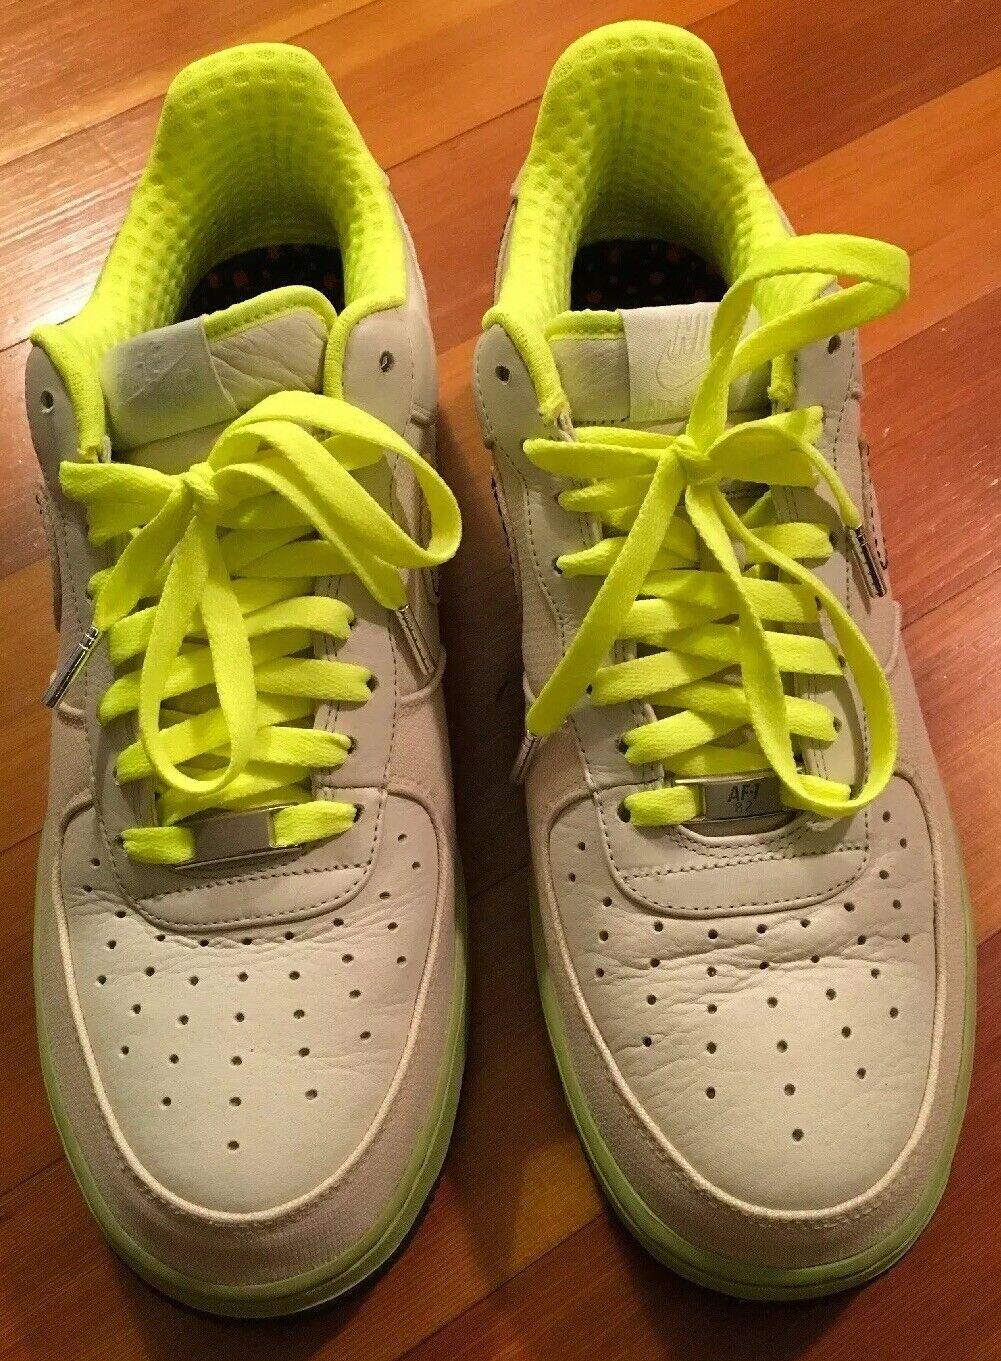 Nike Air Force One 1 XXV Tgoldnto Bone Volt Linen Size 10.5 (315180-002) 2007